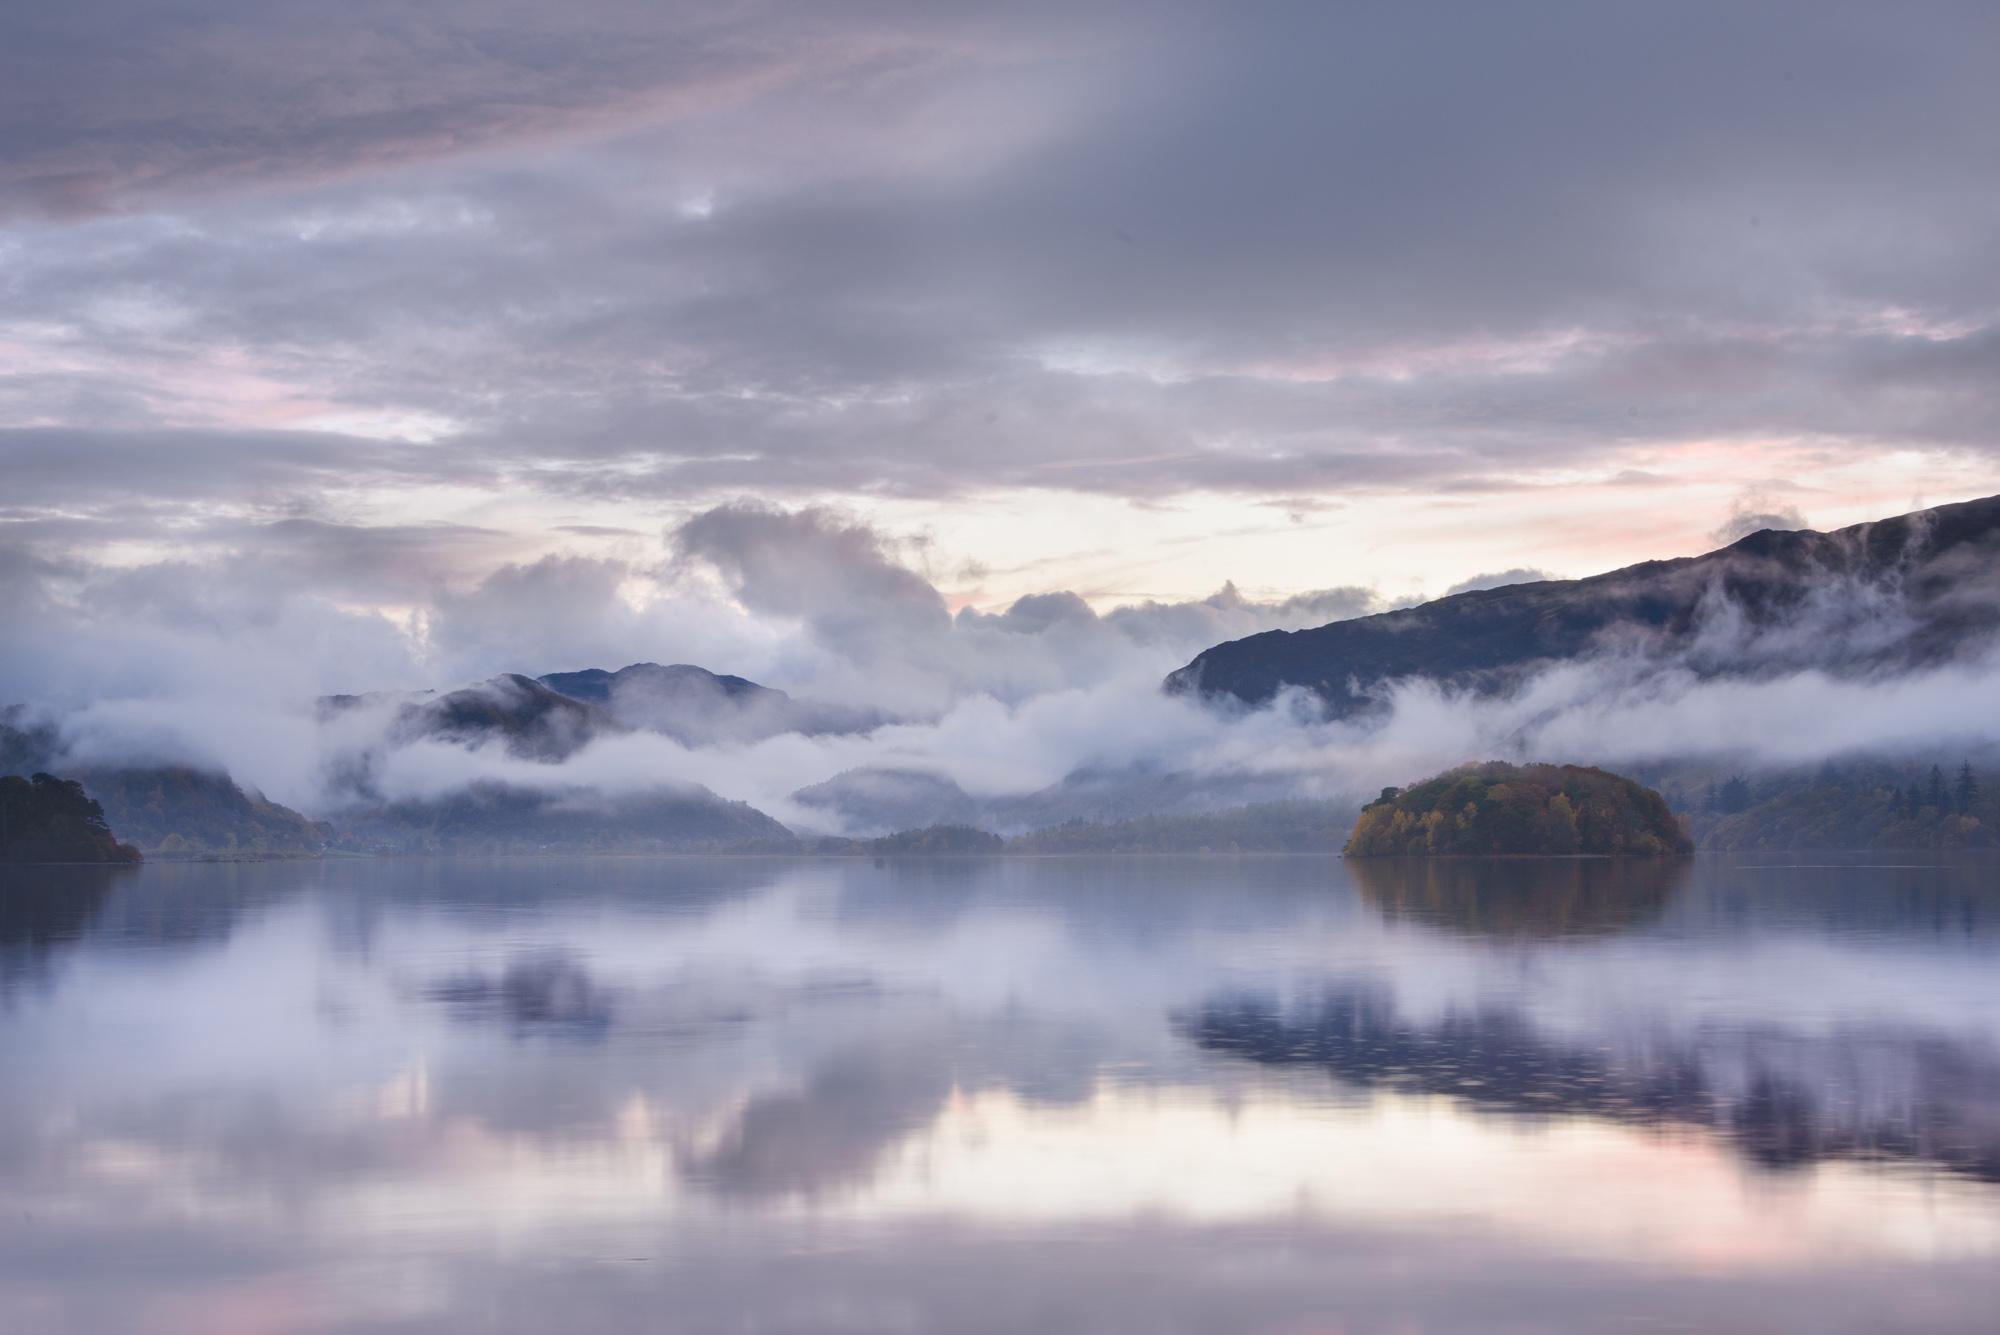 Borrowdale mist (2)